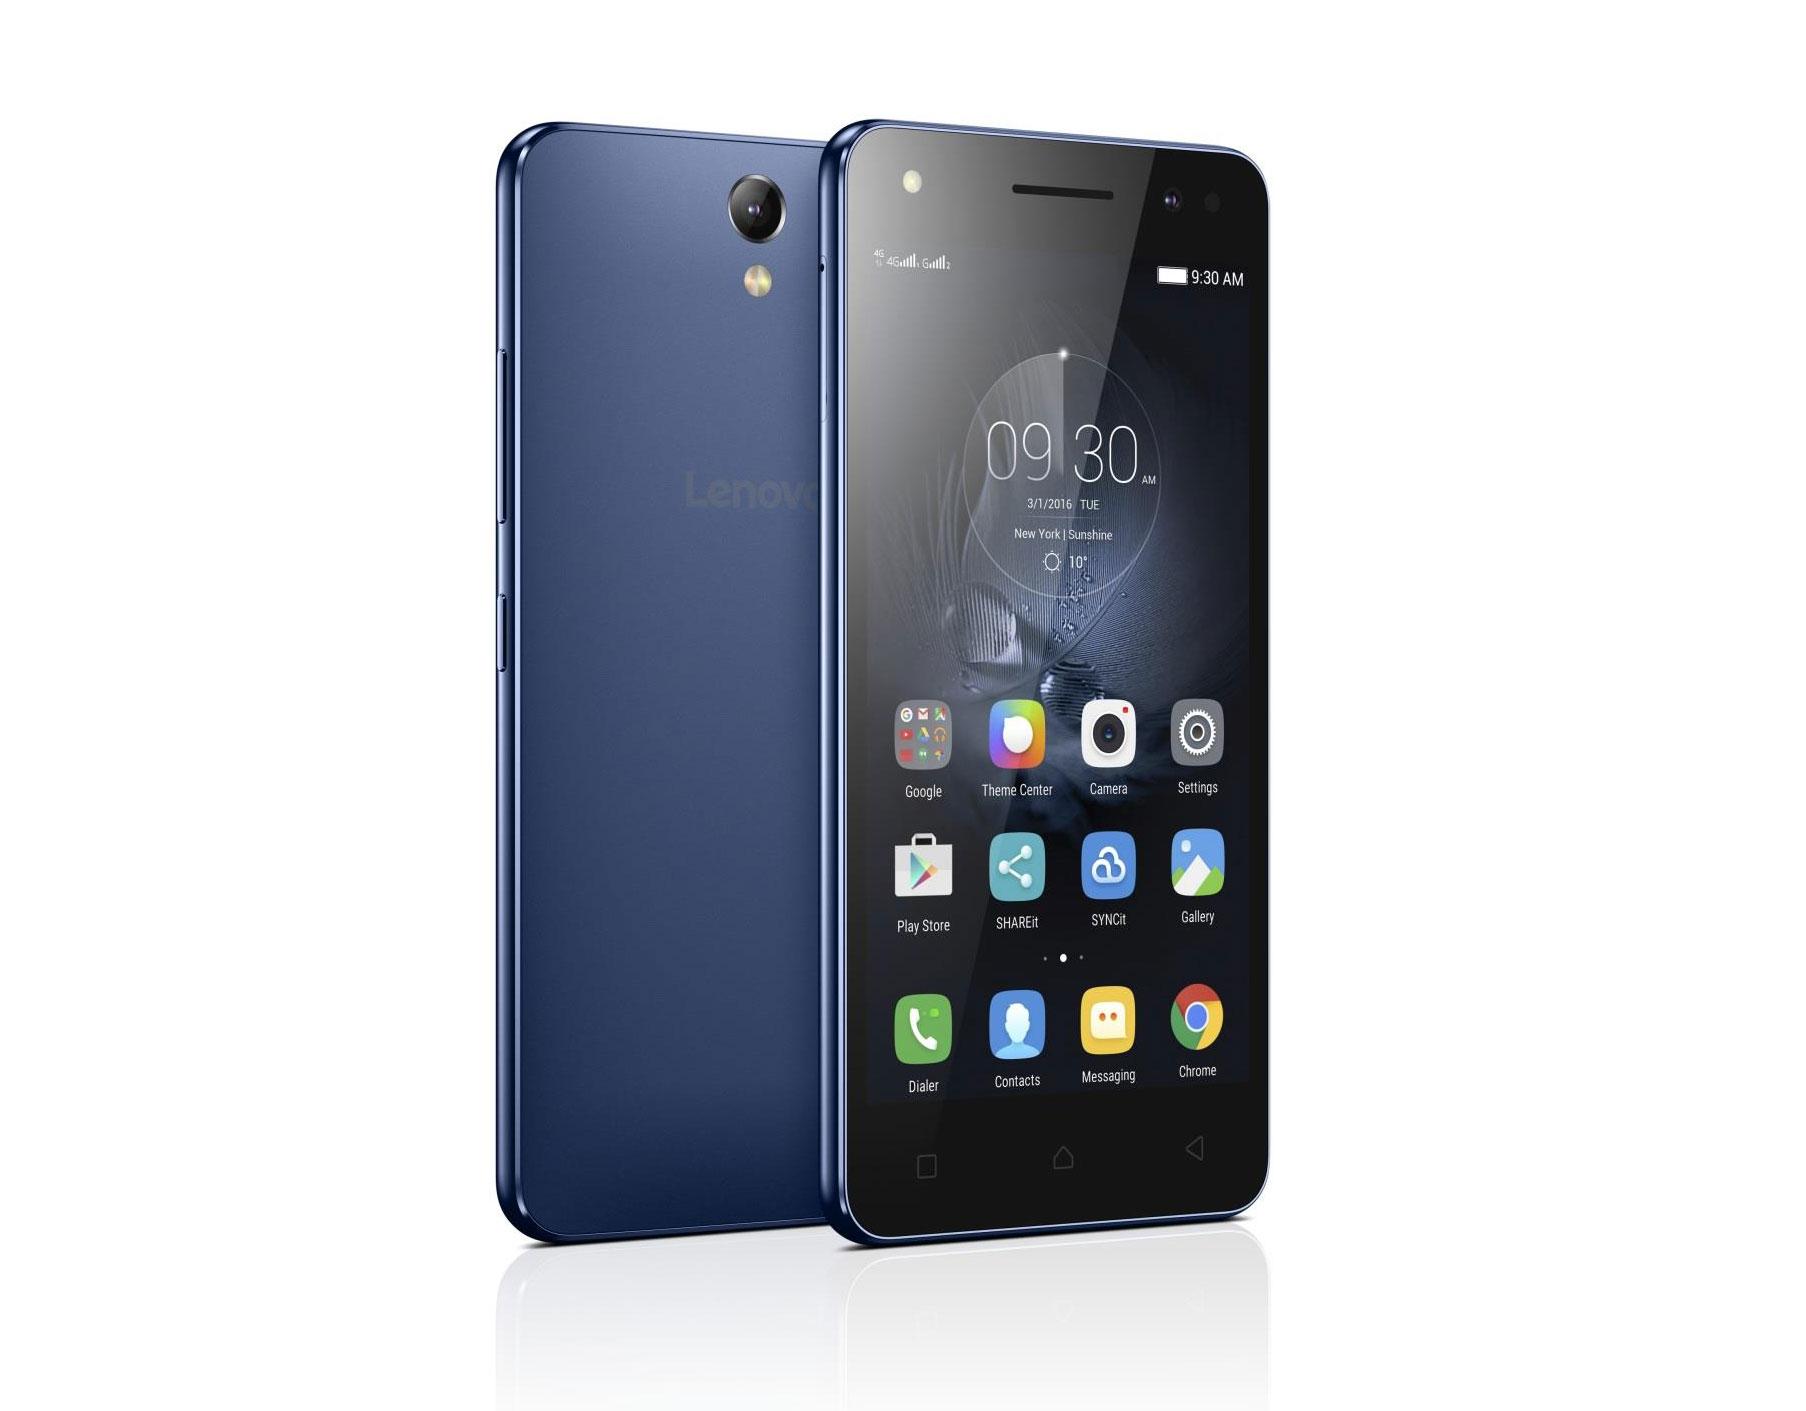 OUTLET Smartfon Lenovo Vibe S1 OctaCore 2 16GB LTE